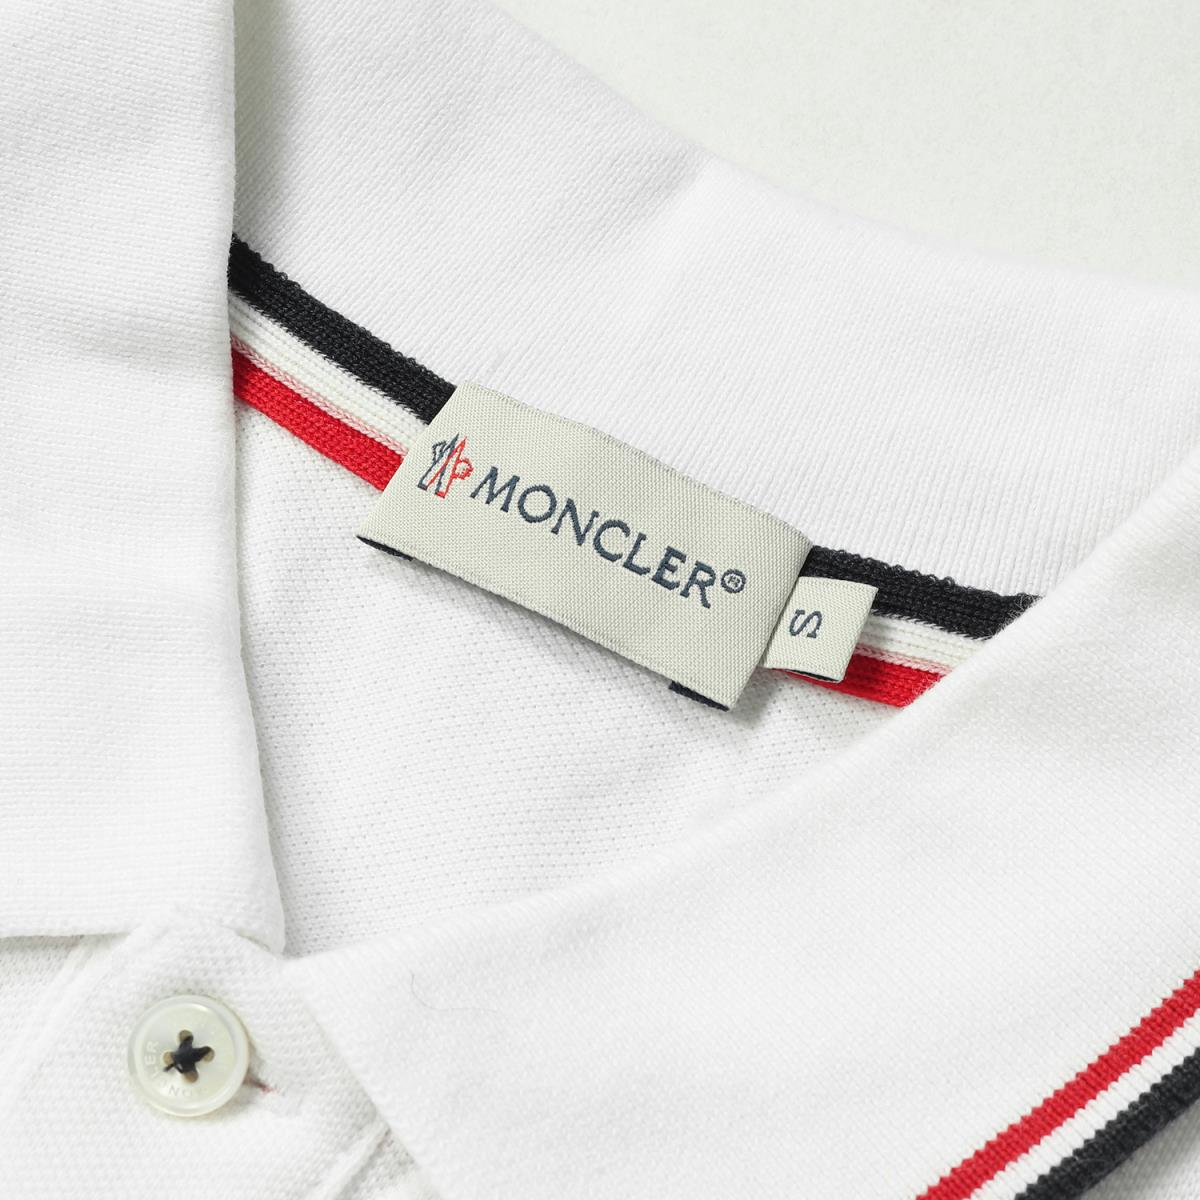 b77b930b9 Tricolor rib line fawn cotton short sleeves polo shirt (MAGLIA POLO MANICA  CORTA) white S with the MONCLER (Monk rail) emblem